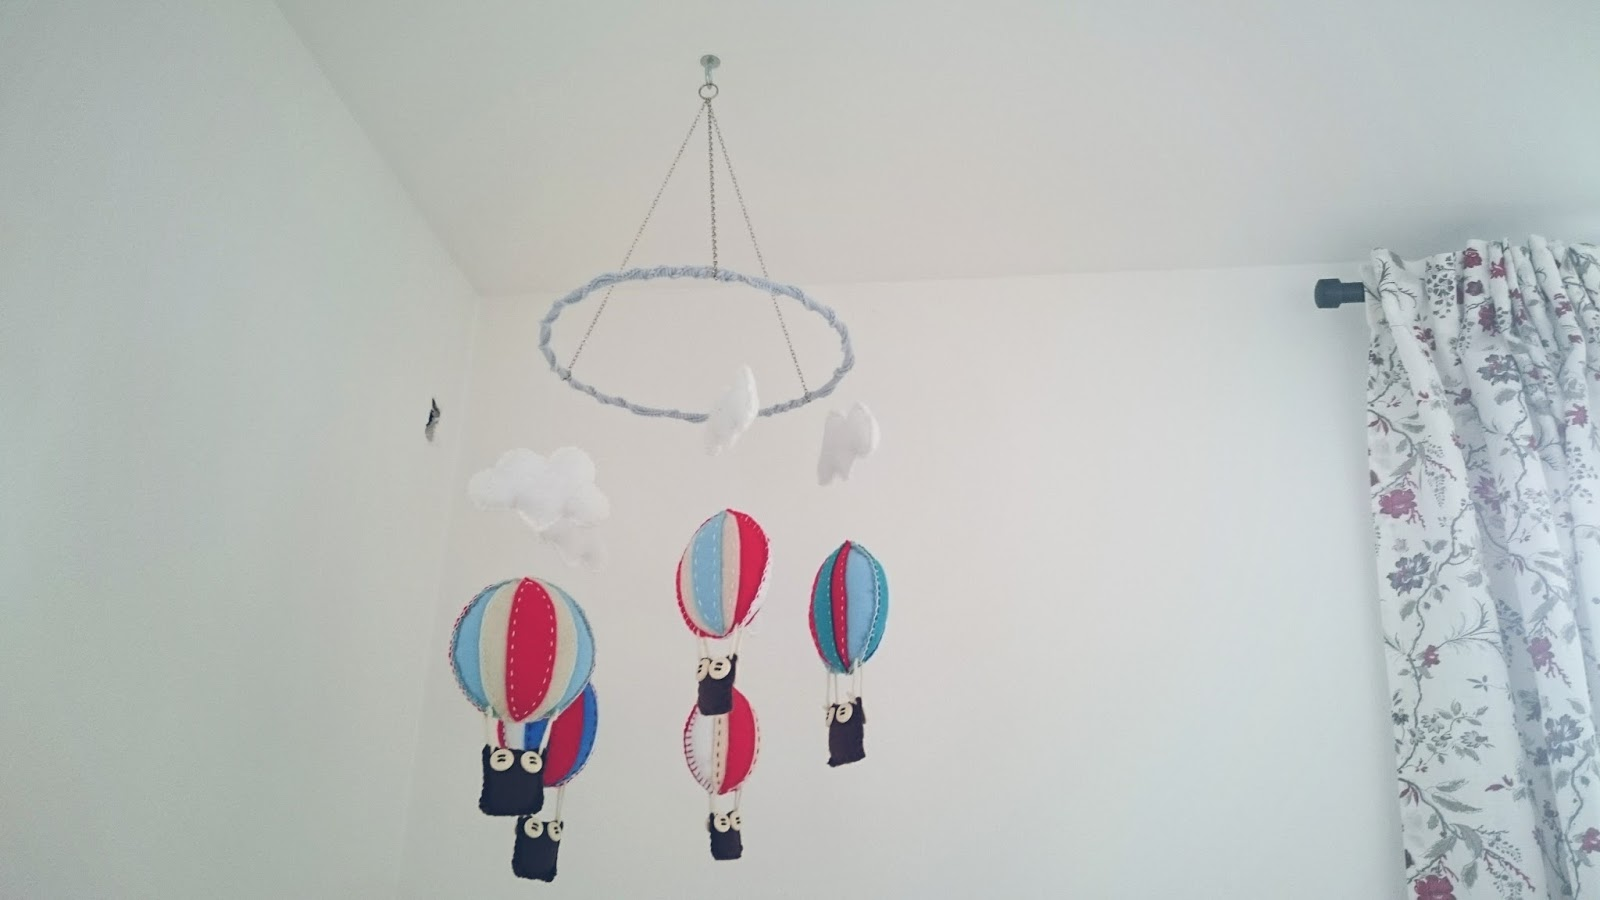 Gemutshandwerk Diy Ballon Mobile Aus Filz